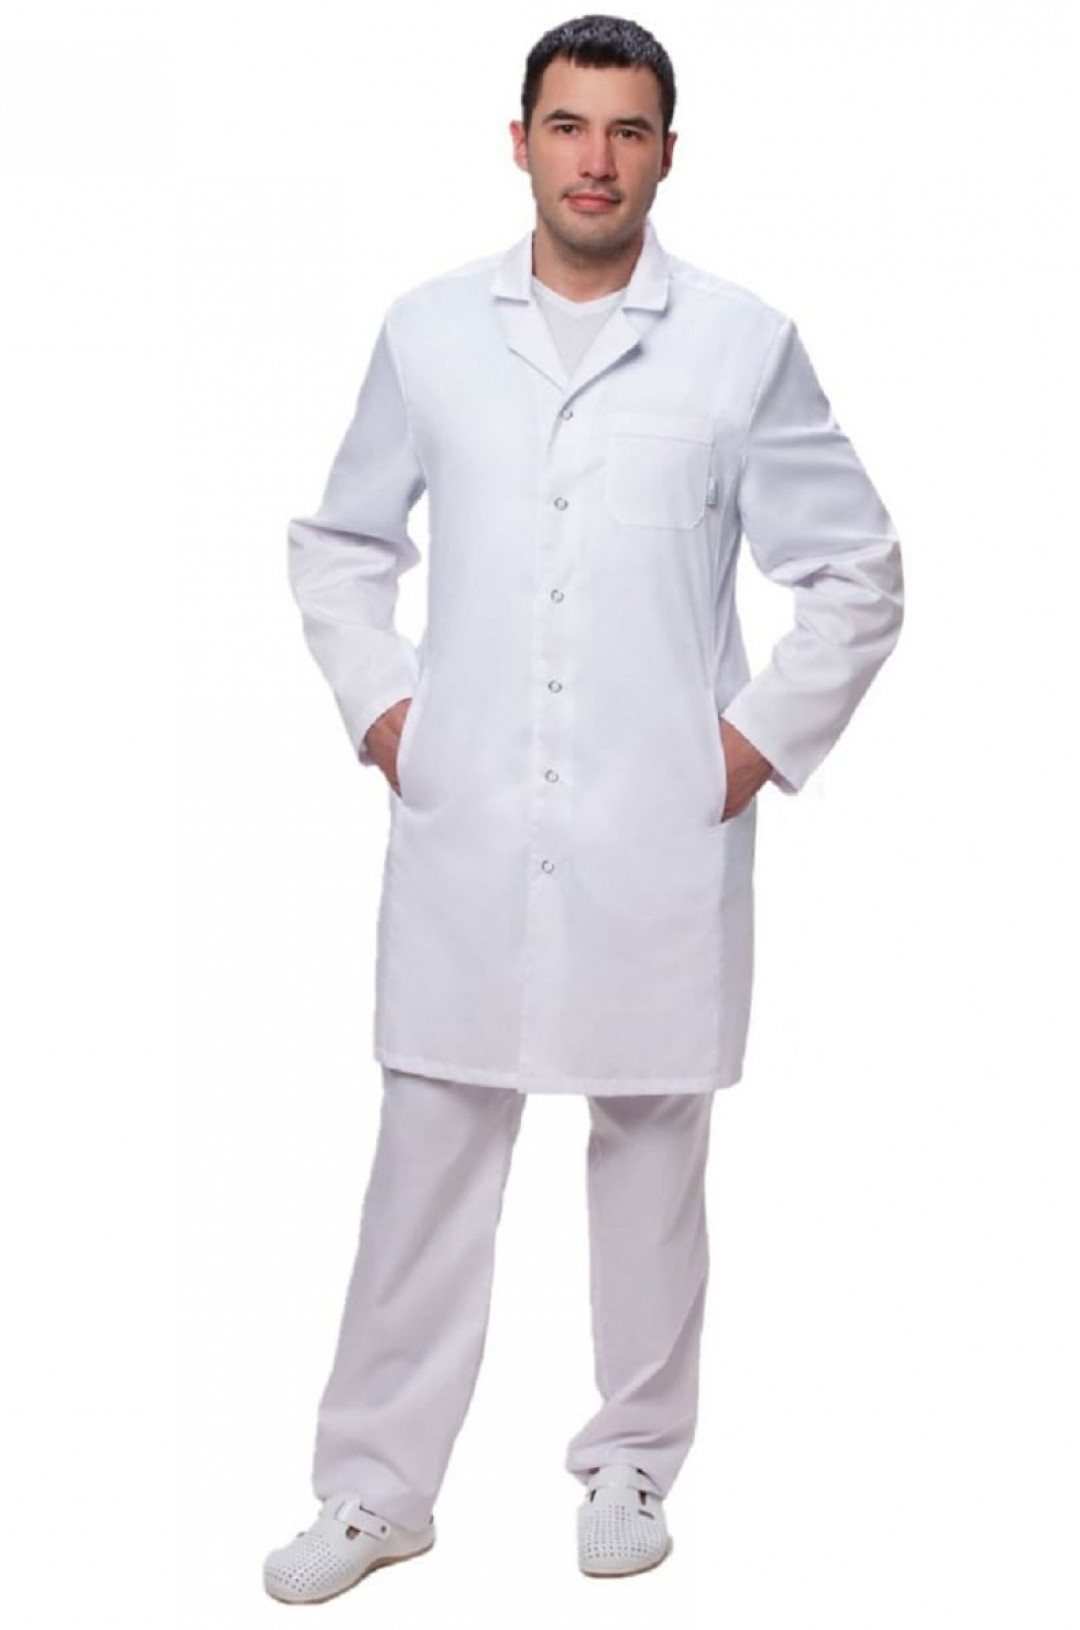 Халат медицинский мужской 501 (белый, тиси)